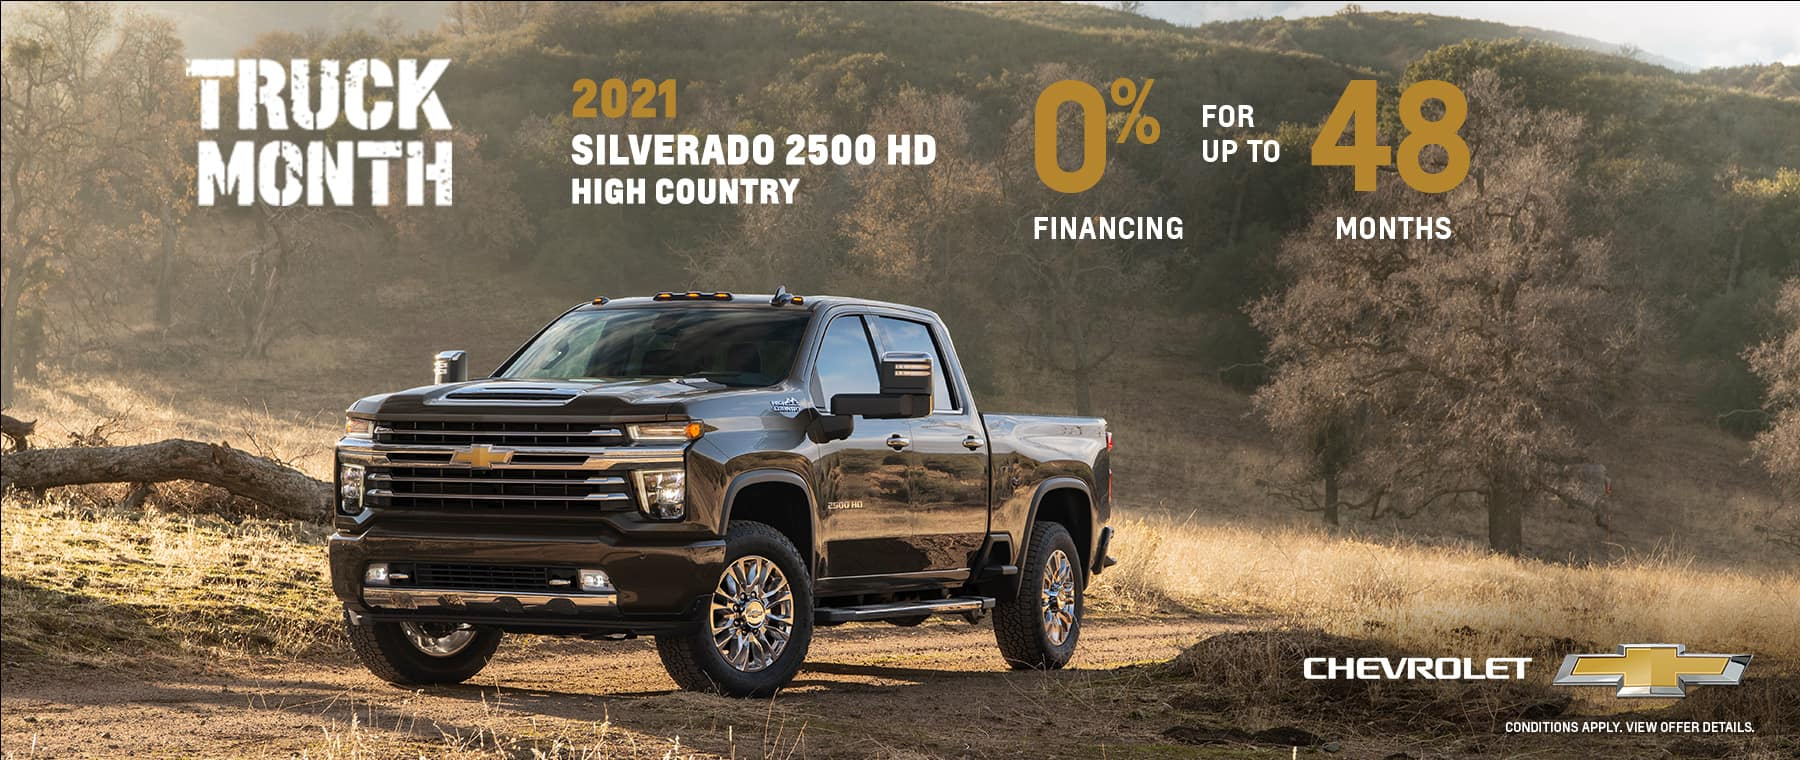 2021_APR_WST_Chevy_T3_EN_1800x760_TRUCK_Silverado-2500_ABPR